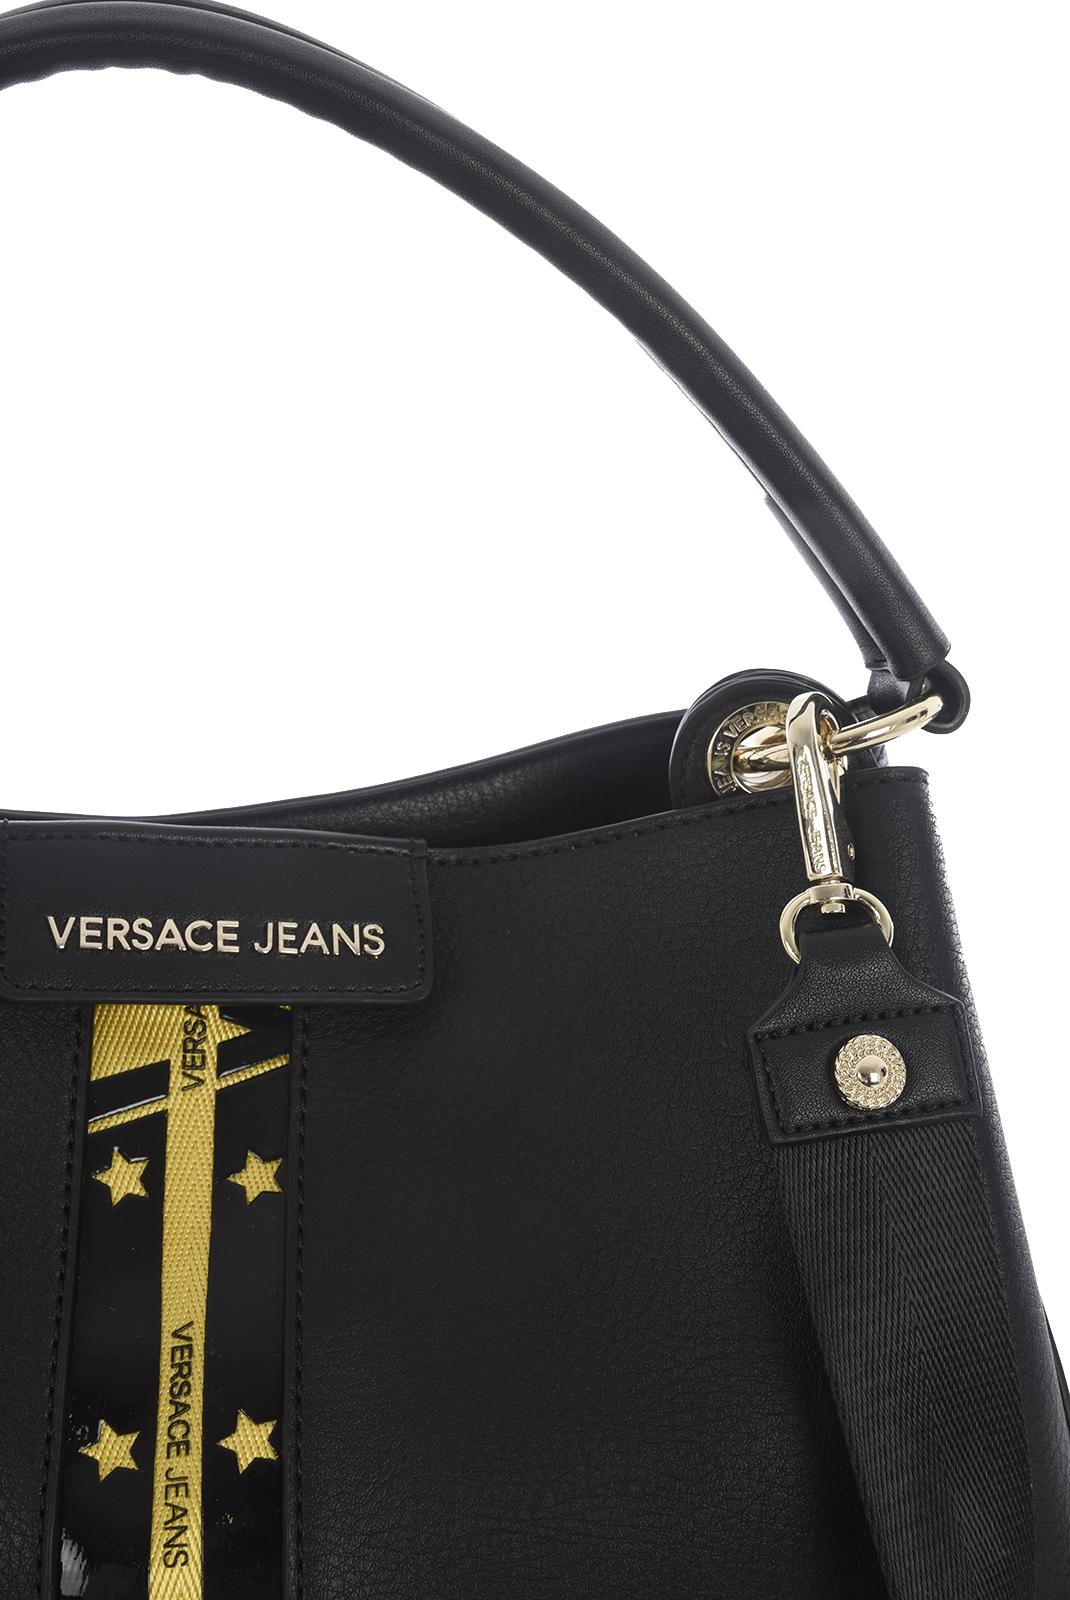 Sacs à Main  Versace Jeans VRBBN5 899 NOIR